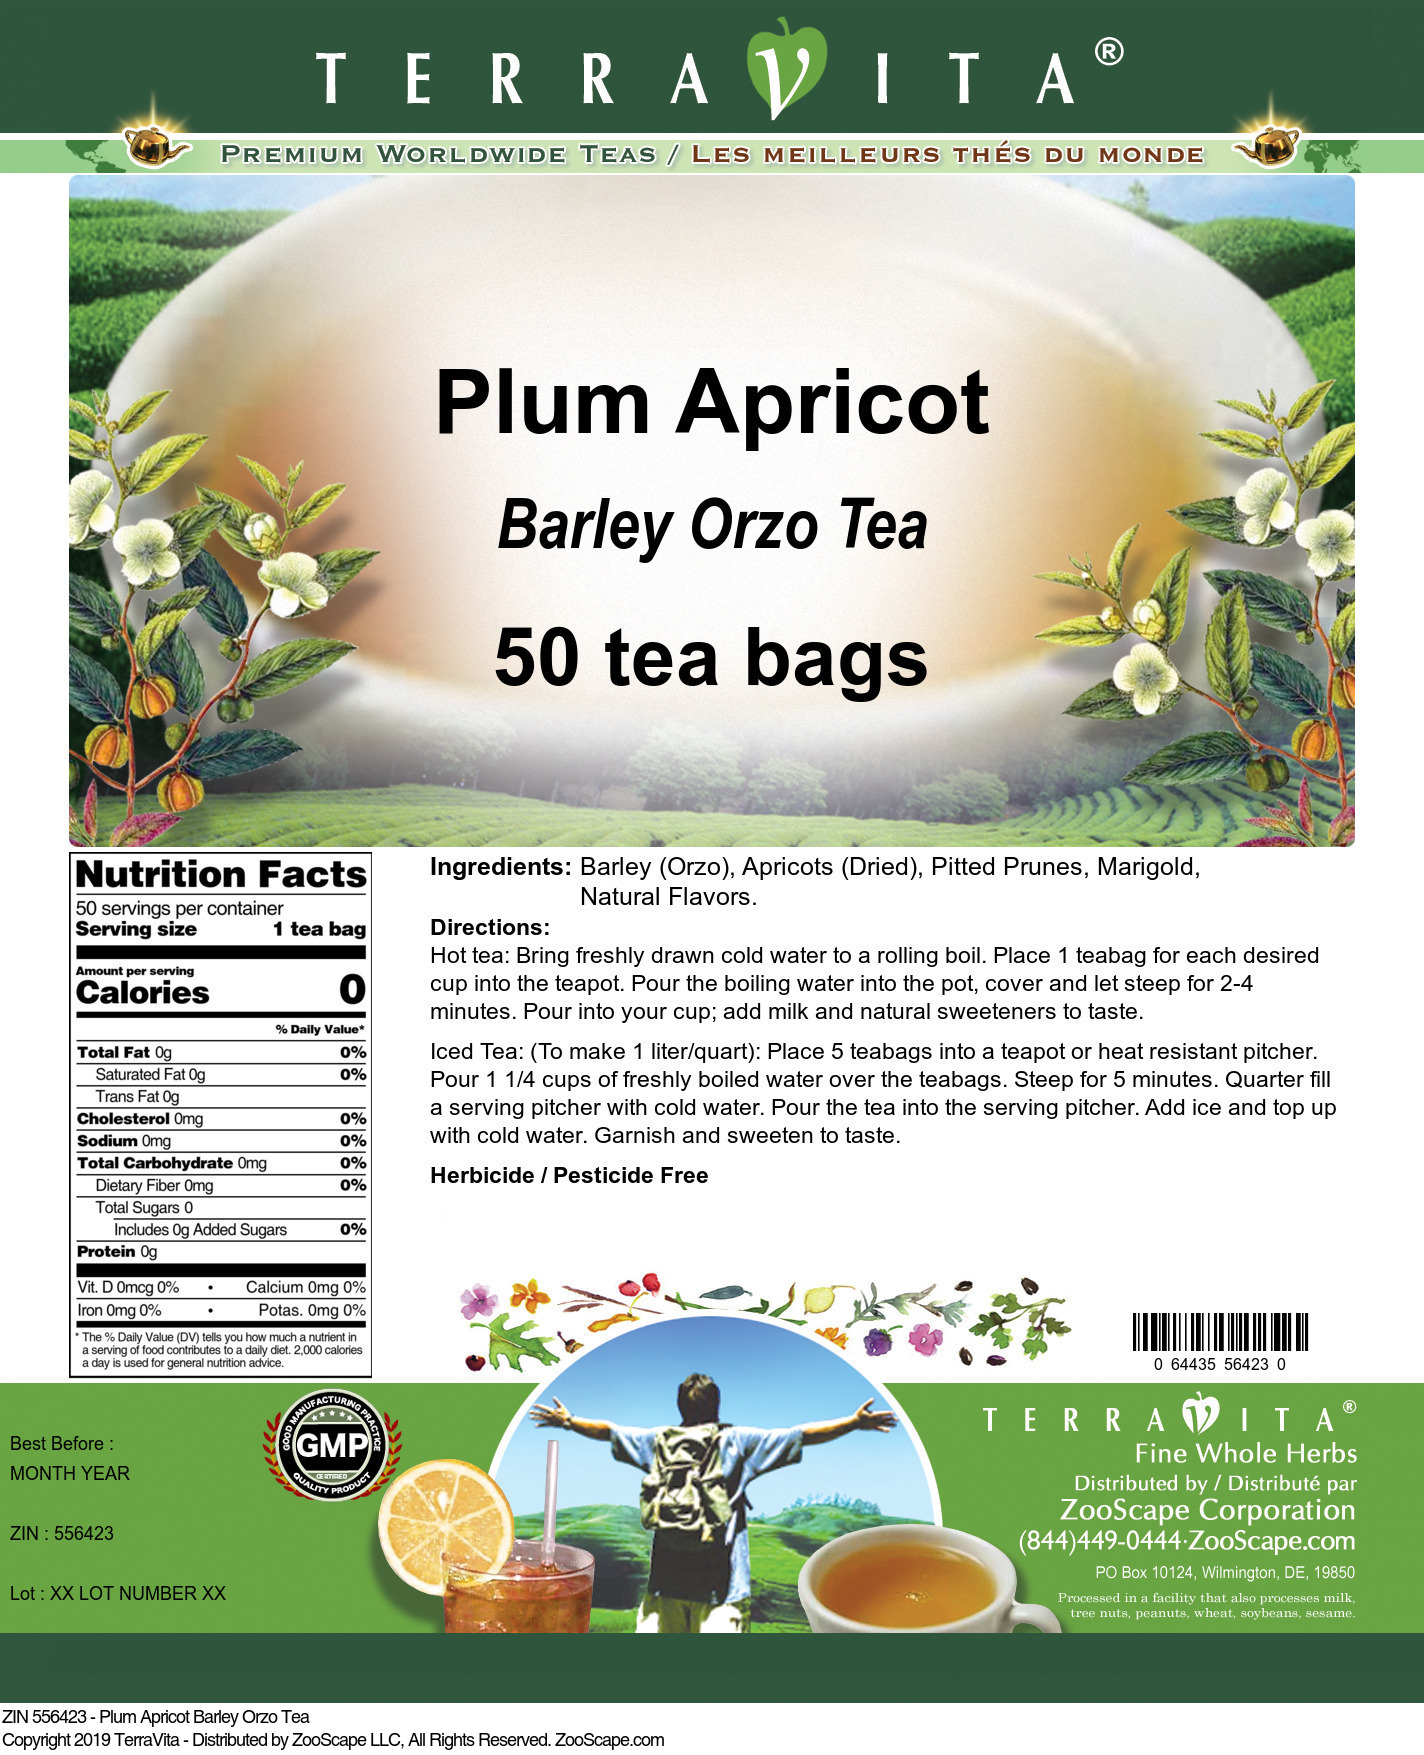 Plum Apricot Barley Orzo